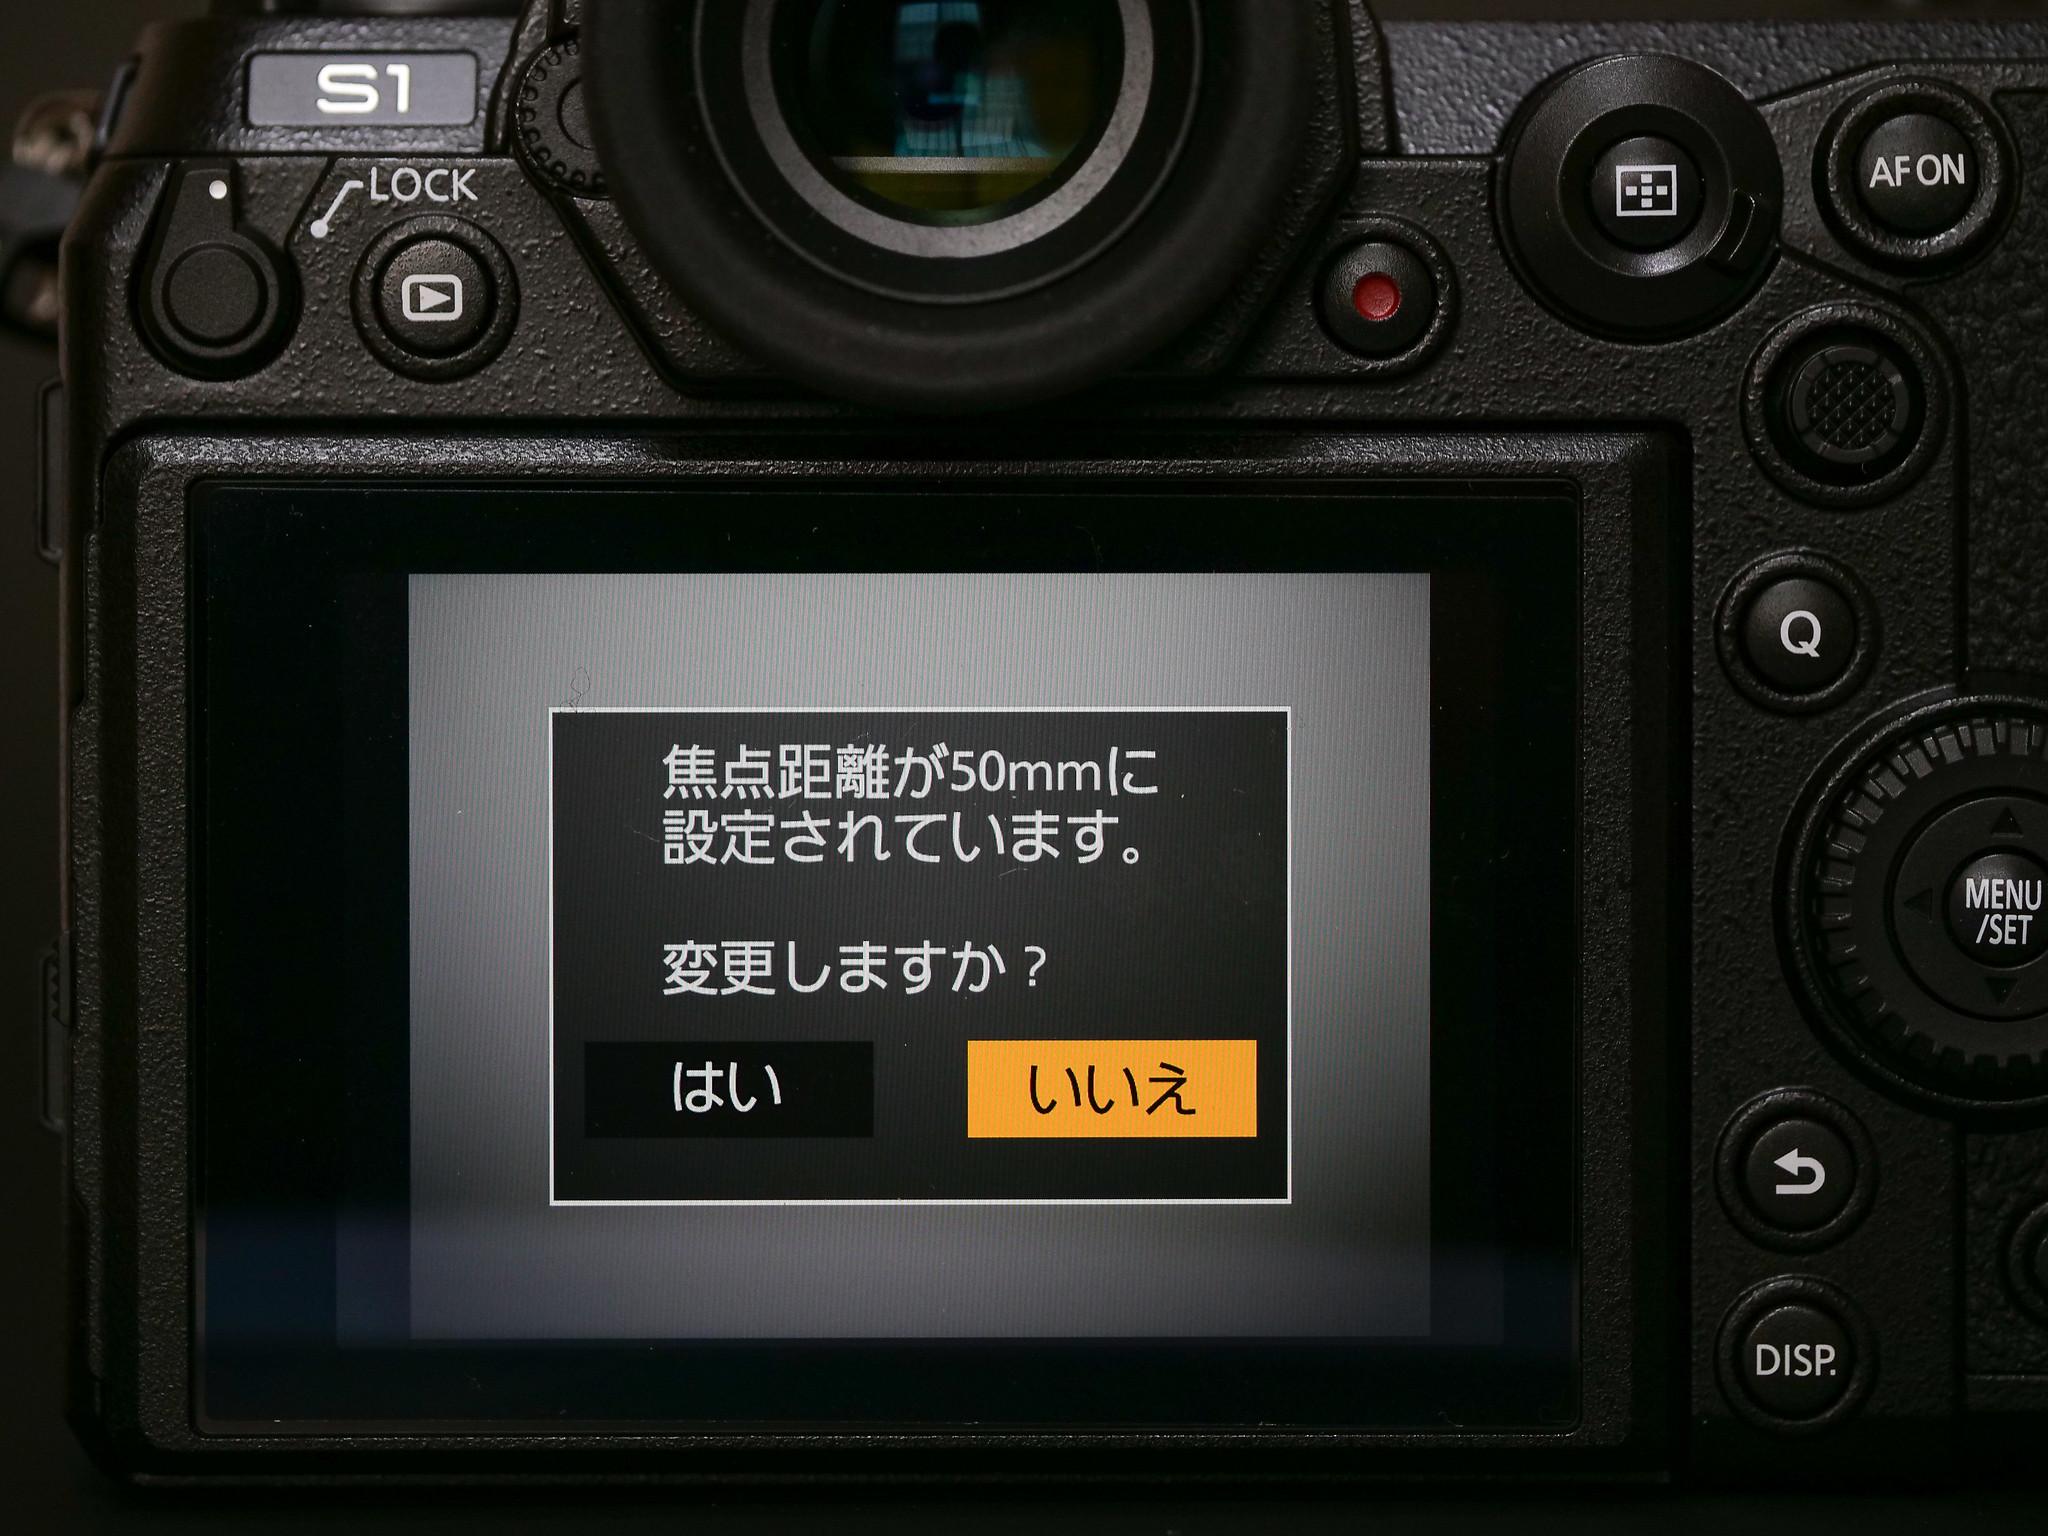 P1279183.jpg